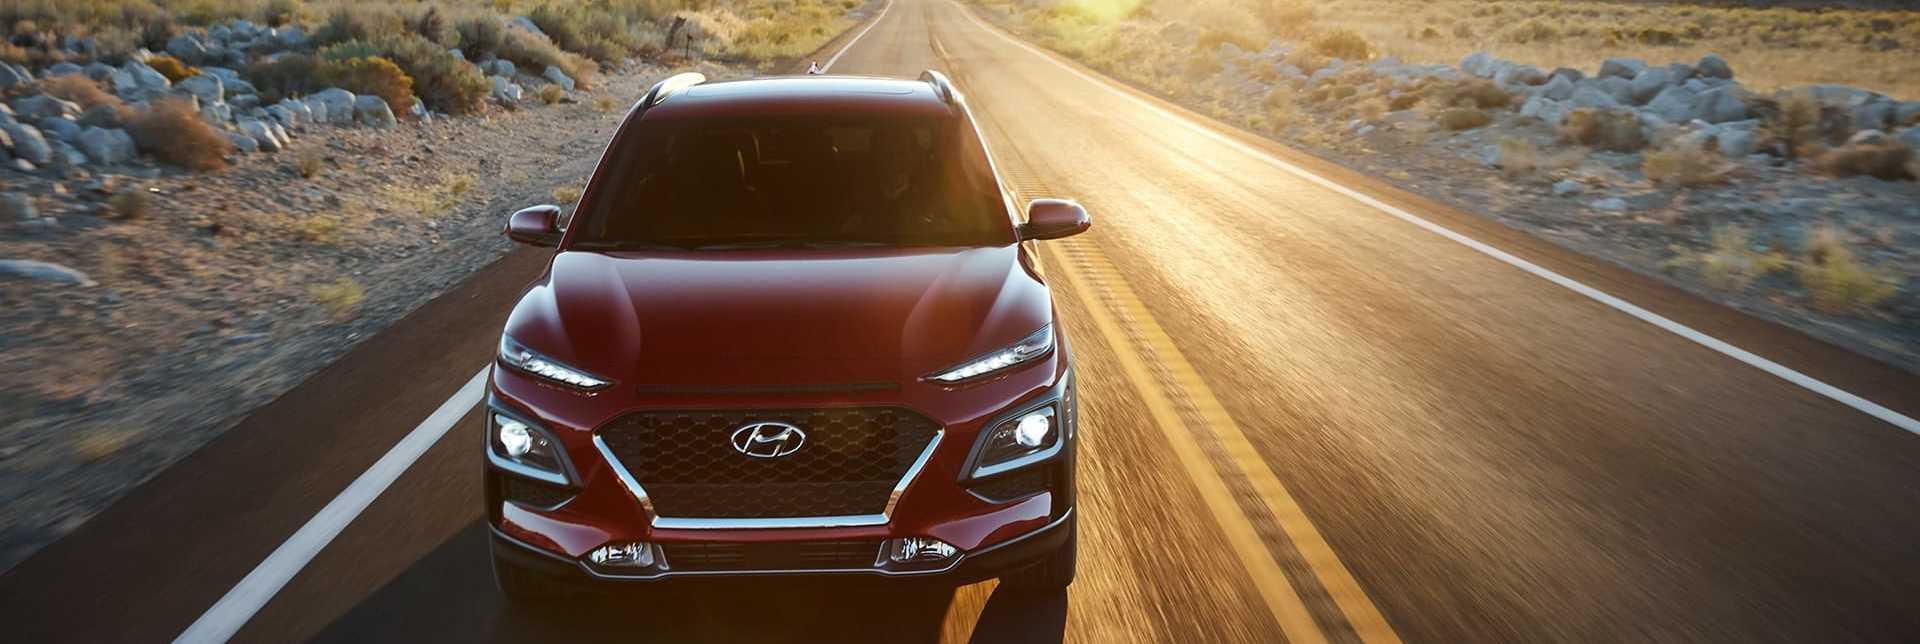 2020 Hyundai Kona Leasing near College Park, MD